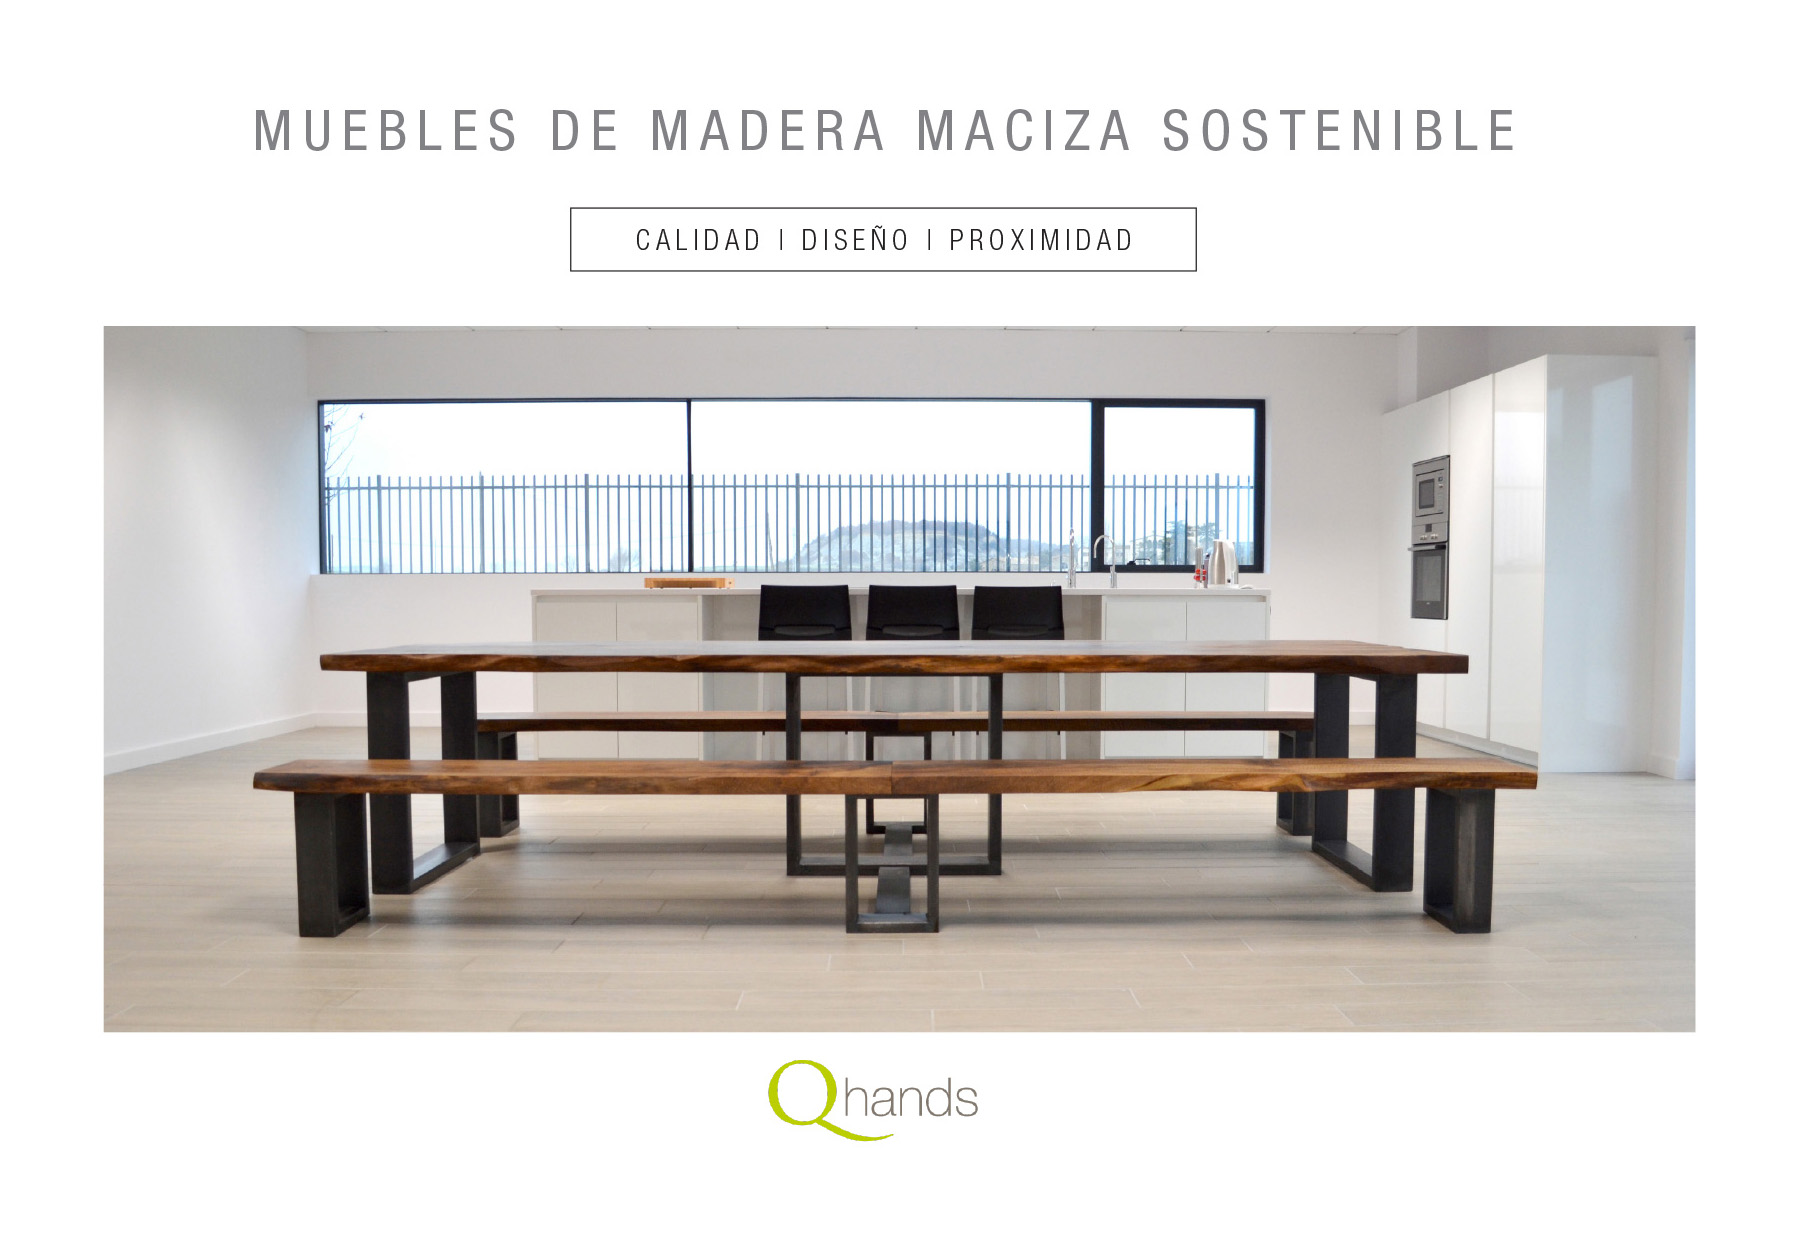 Arquitectura Interiorismo Construcci N La Vanguardia  # Muebles De Madera Sostenible